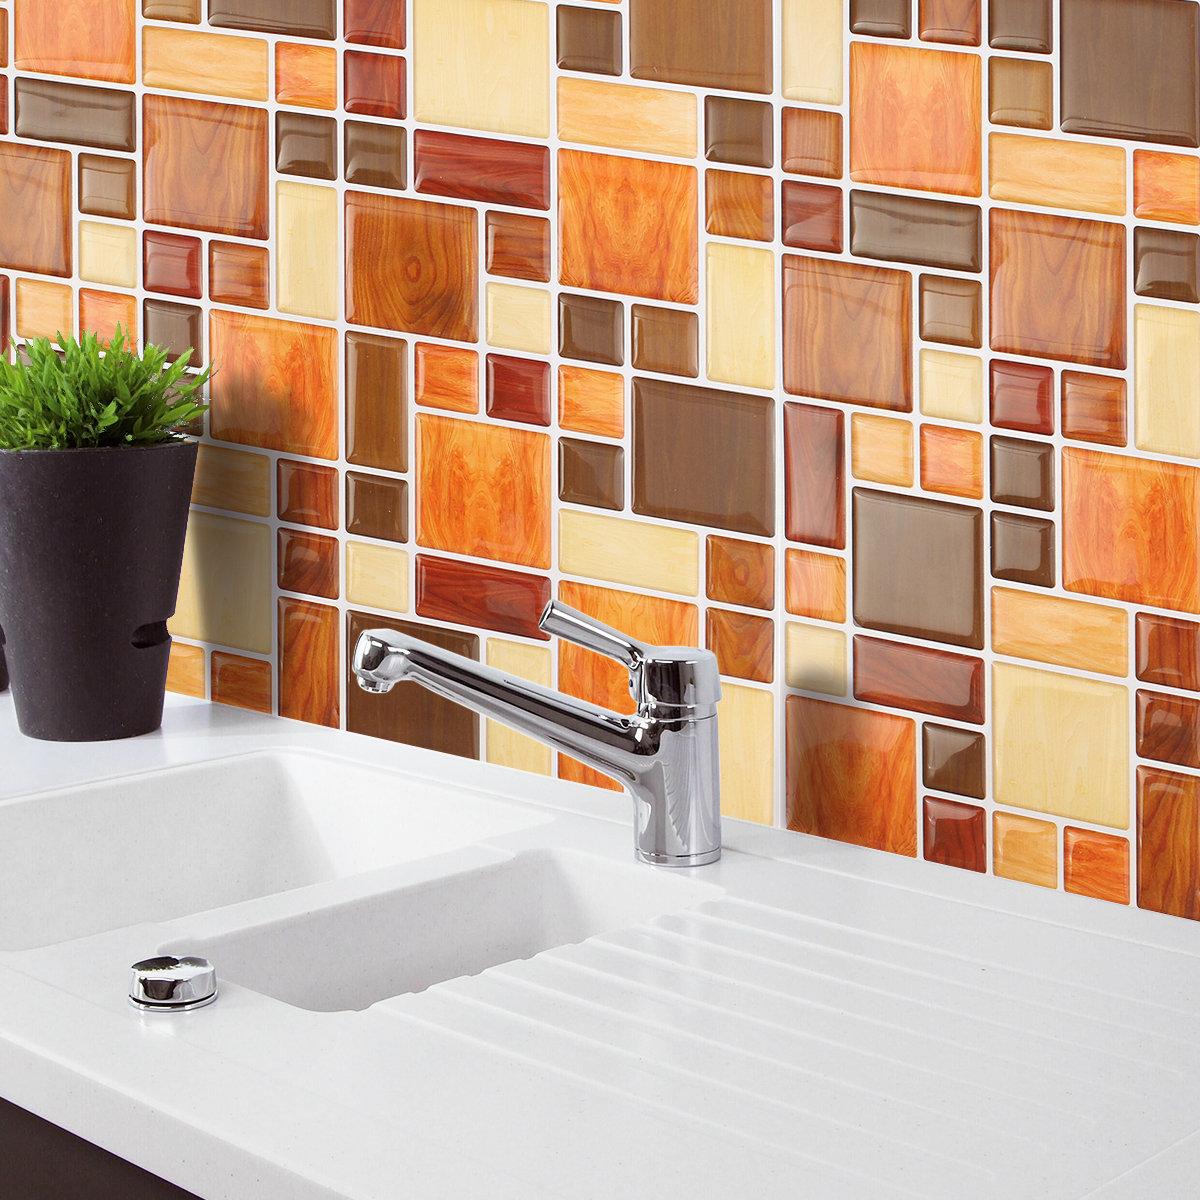 orange kitchen wallpaper unique islands brown creative 3d mosaic wall stickers backsplash tile